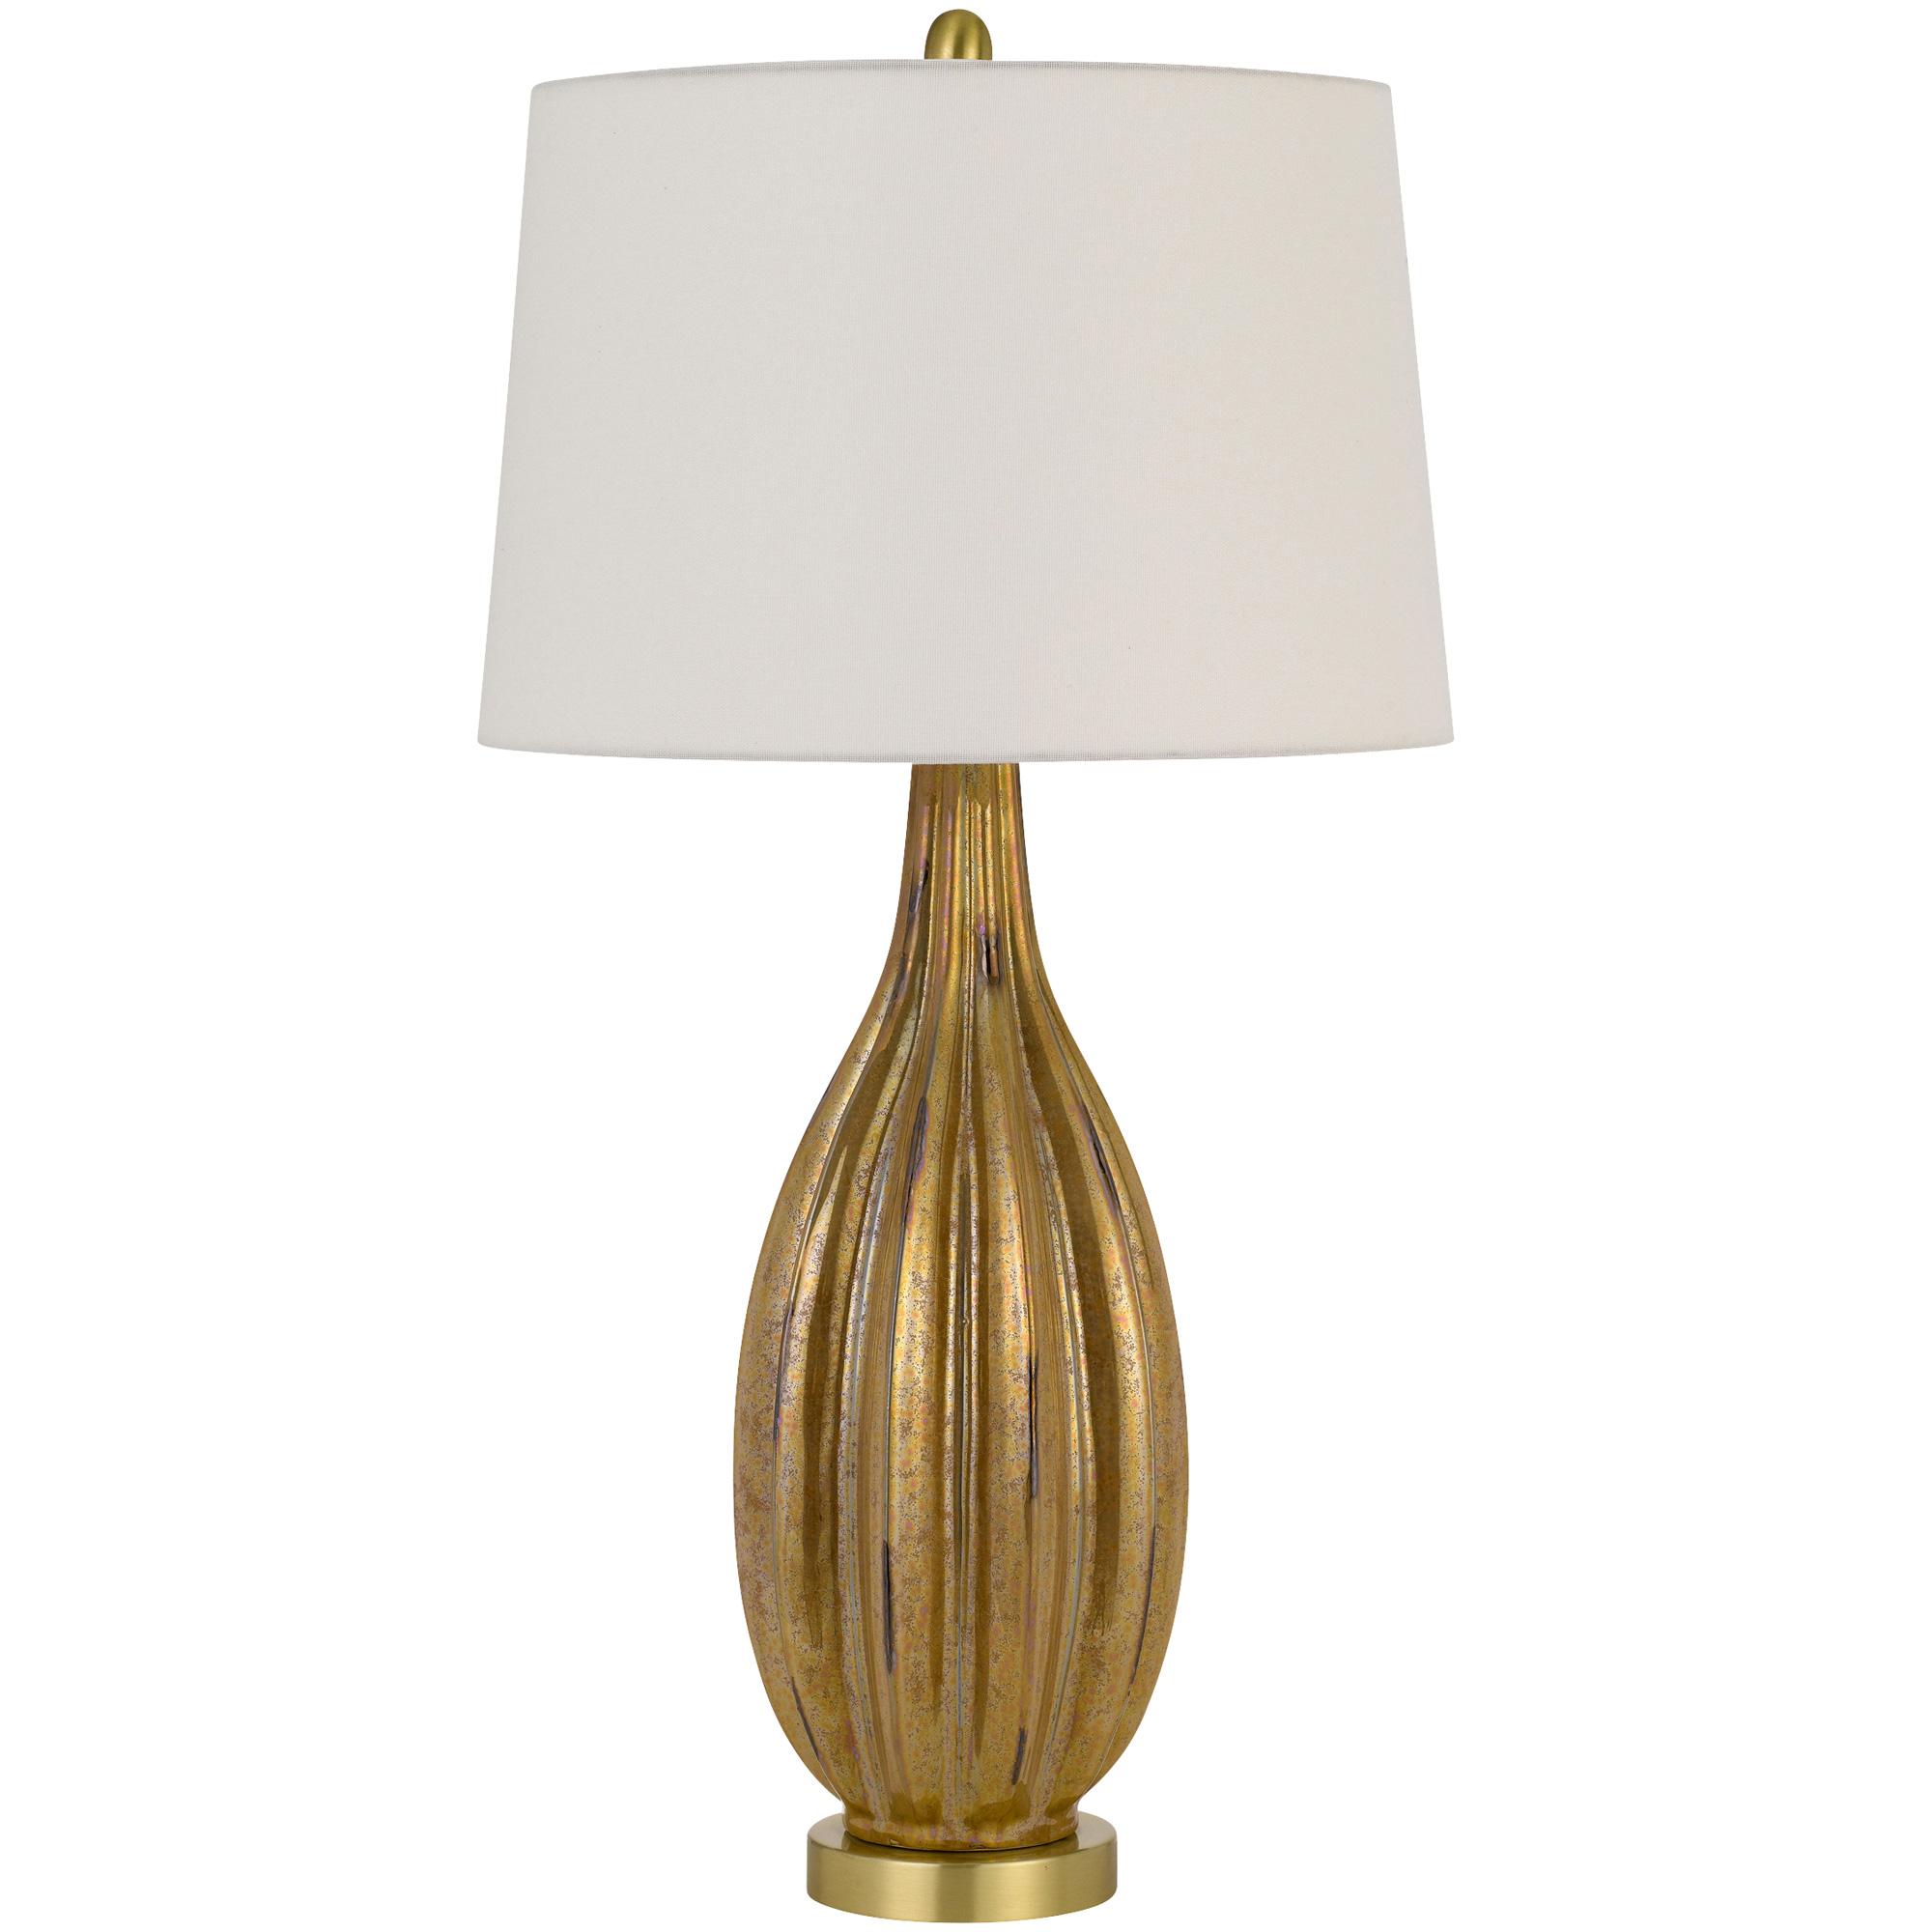 Cal Lighting | Morlaix Gold Table Lamp